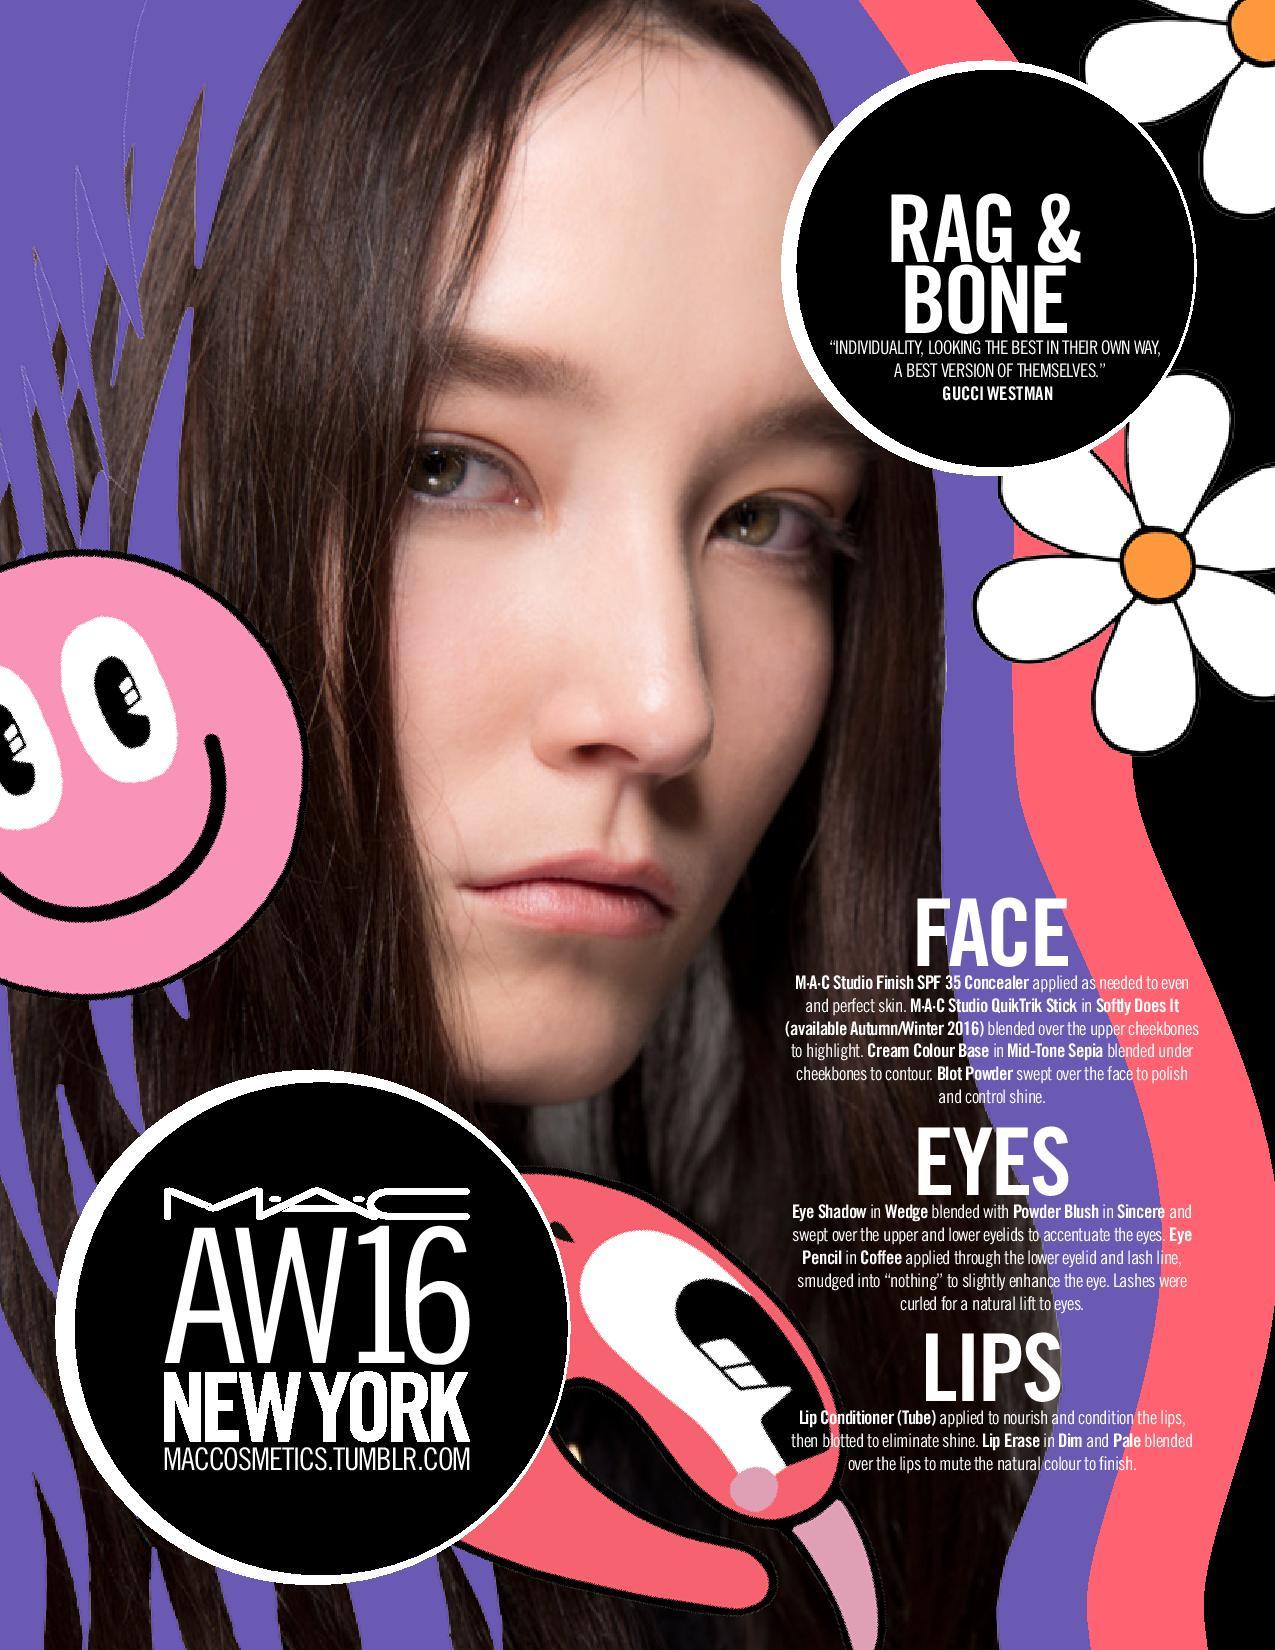 AW16_DAILY FACECHART_NEW YORK_FEB 15 Carolina Herrera, Jeremy Scott, Rag...-page-004